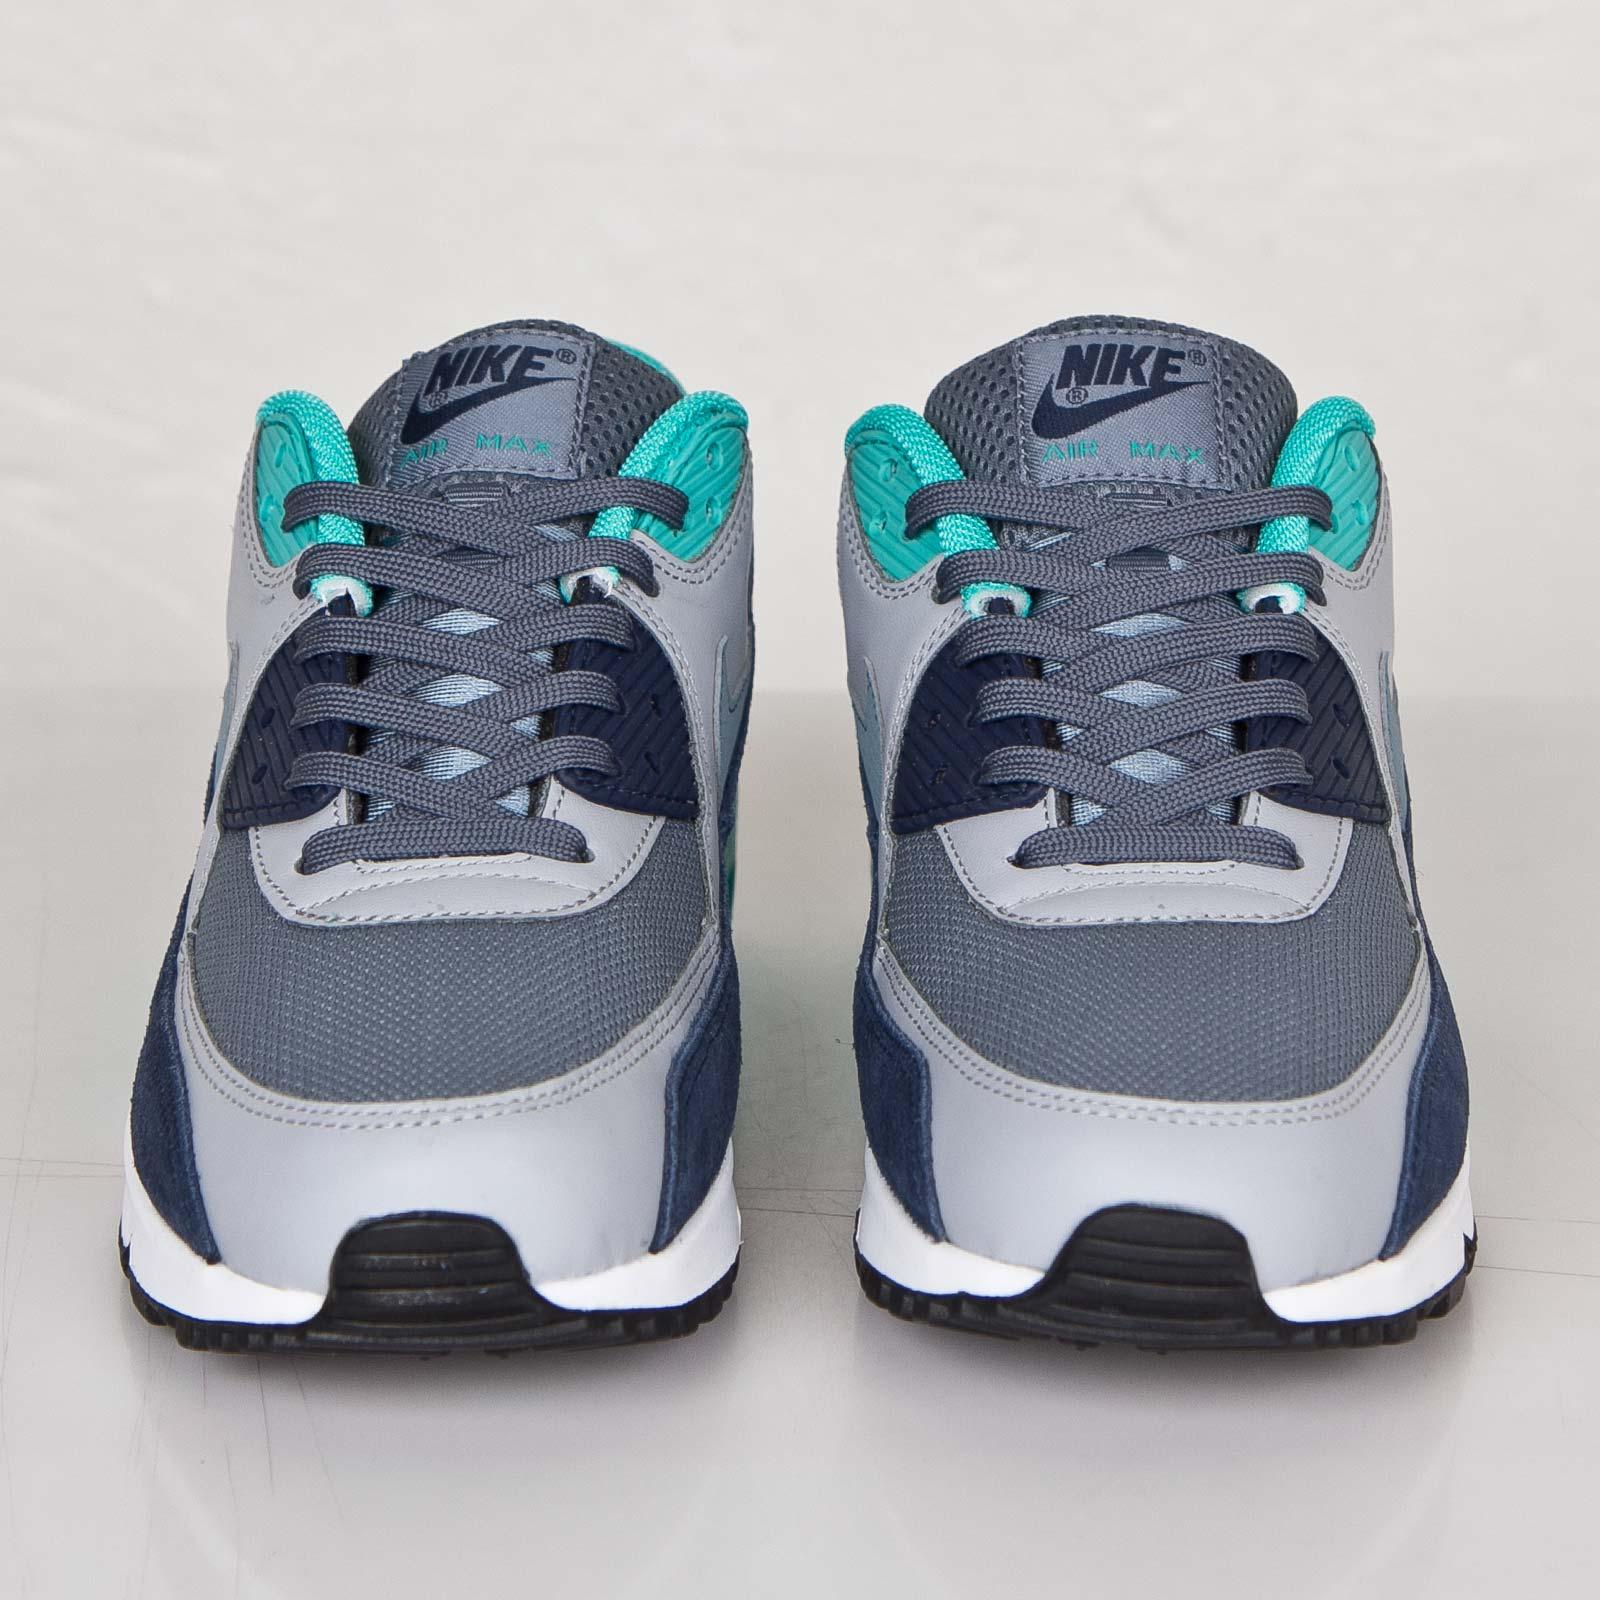 Nike Air Max 90 Essential 537384 408 Sneakersnstuff I